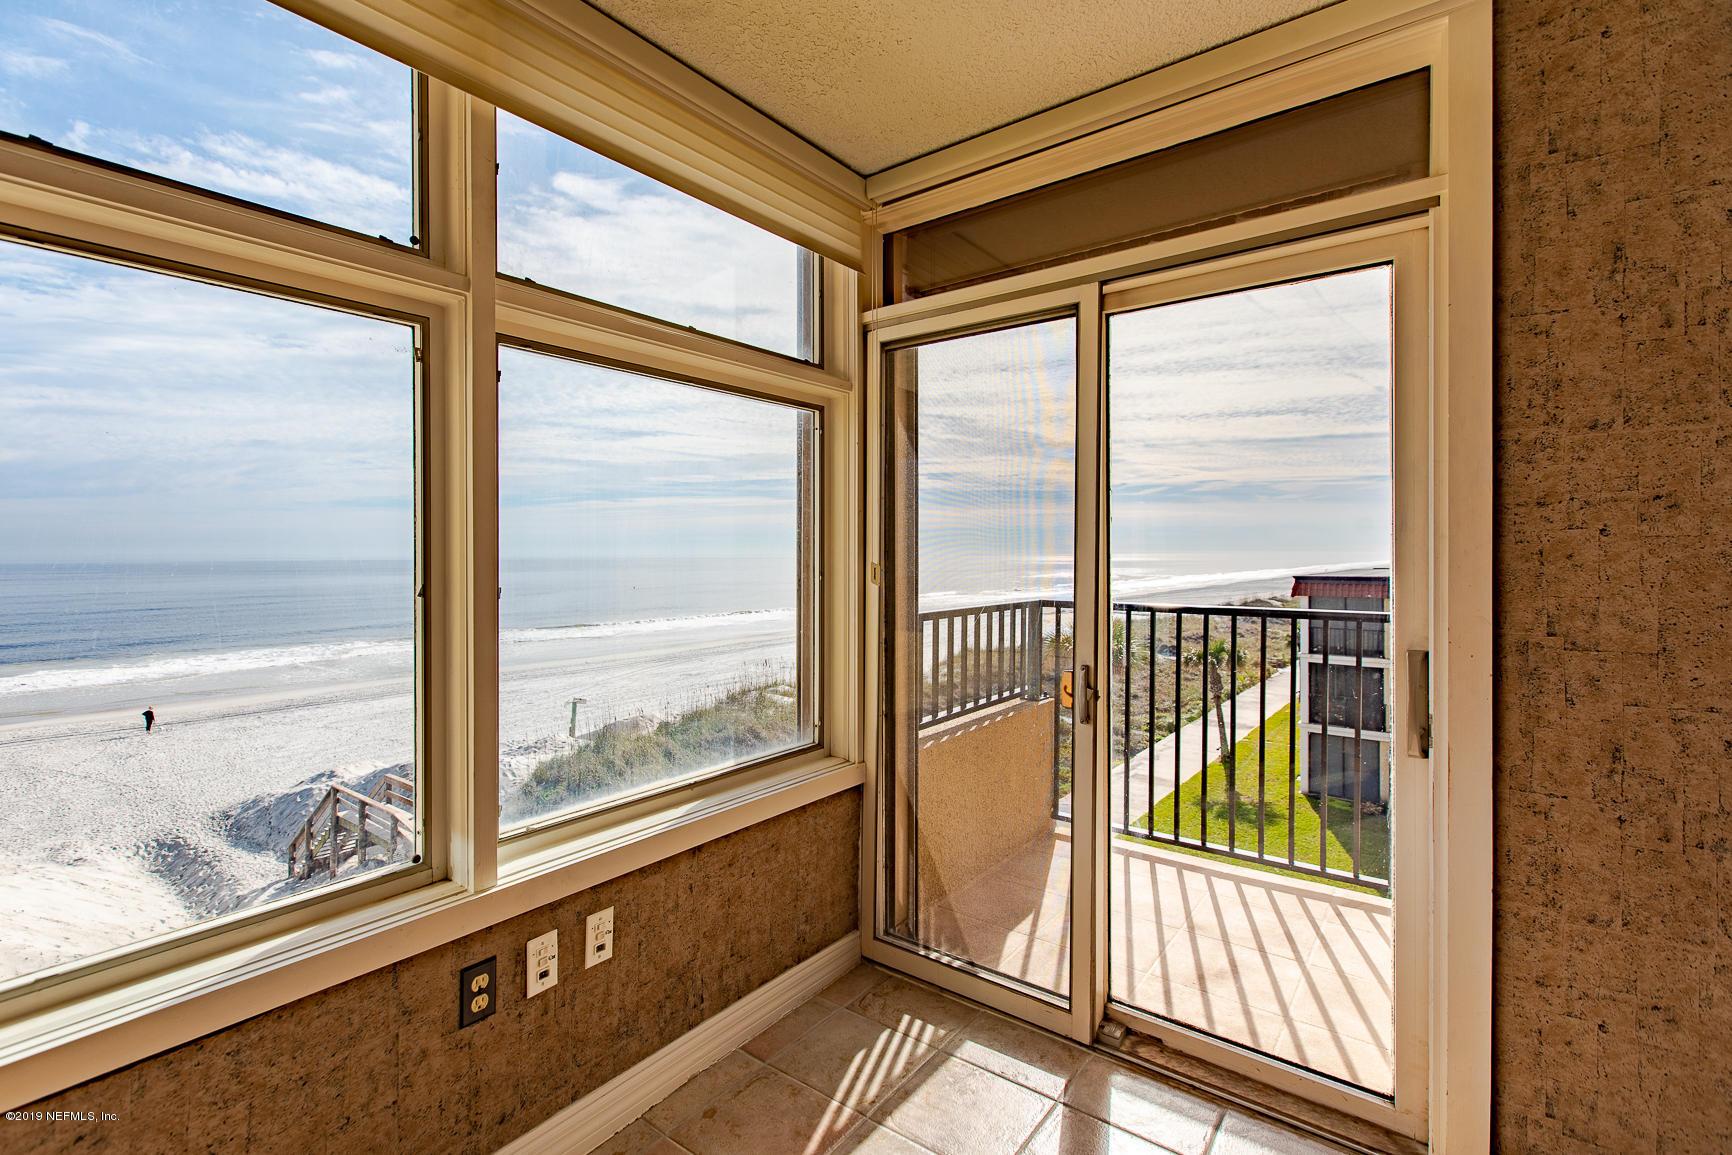 2200 OCEAN, JACKSONVILLE BEACH, FLORIDA 32250, 3 Bedrooms Bedrooms, ,2 BathroomsBathrooms,Residential - condos/townhomes,For sale,OCEAN,981513